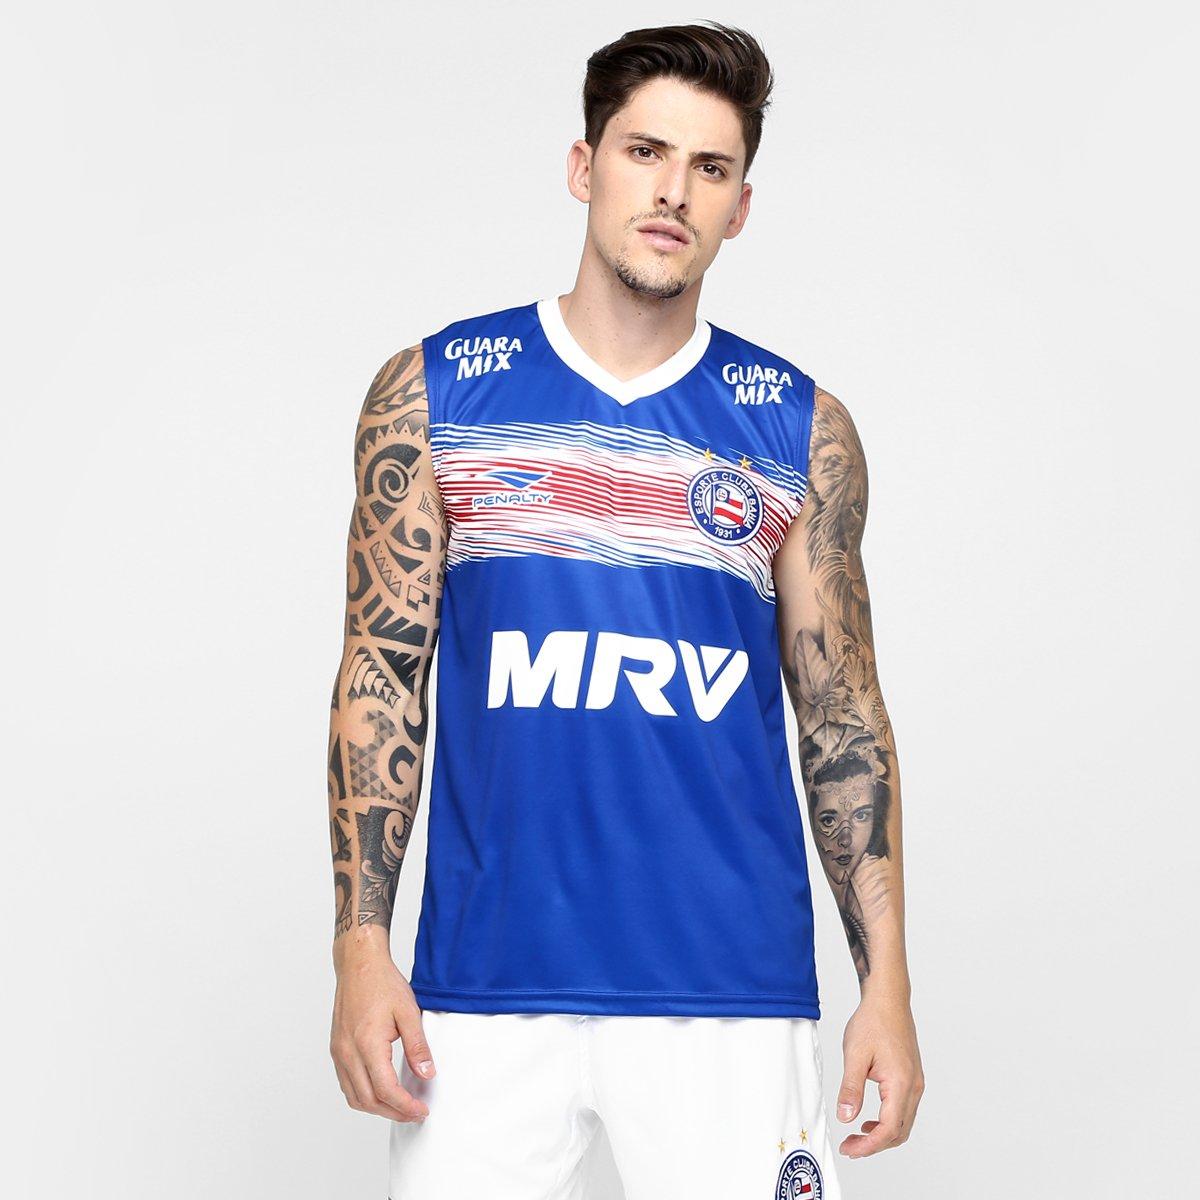 Camisa Penalty Bahia Regata Treino 2016 - Compre Agora  78324917ab3e6